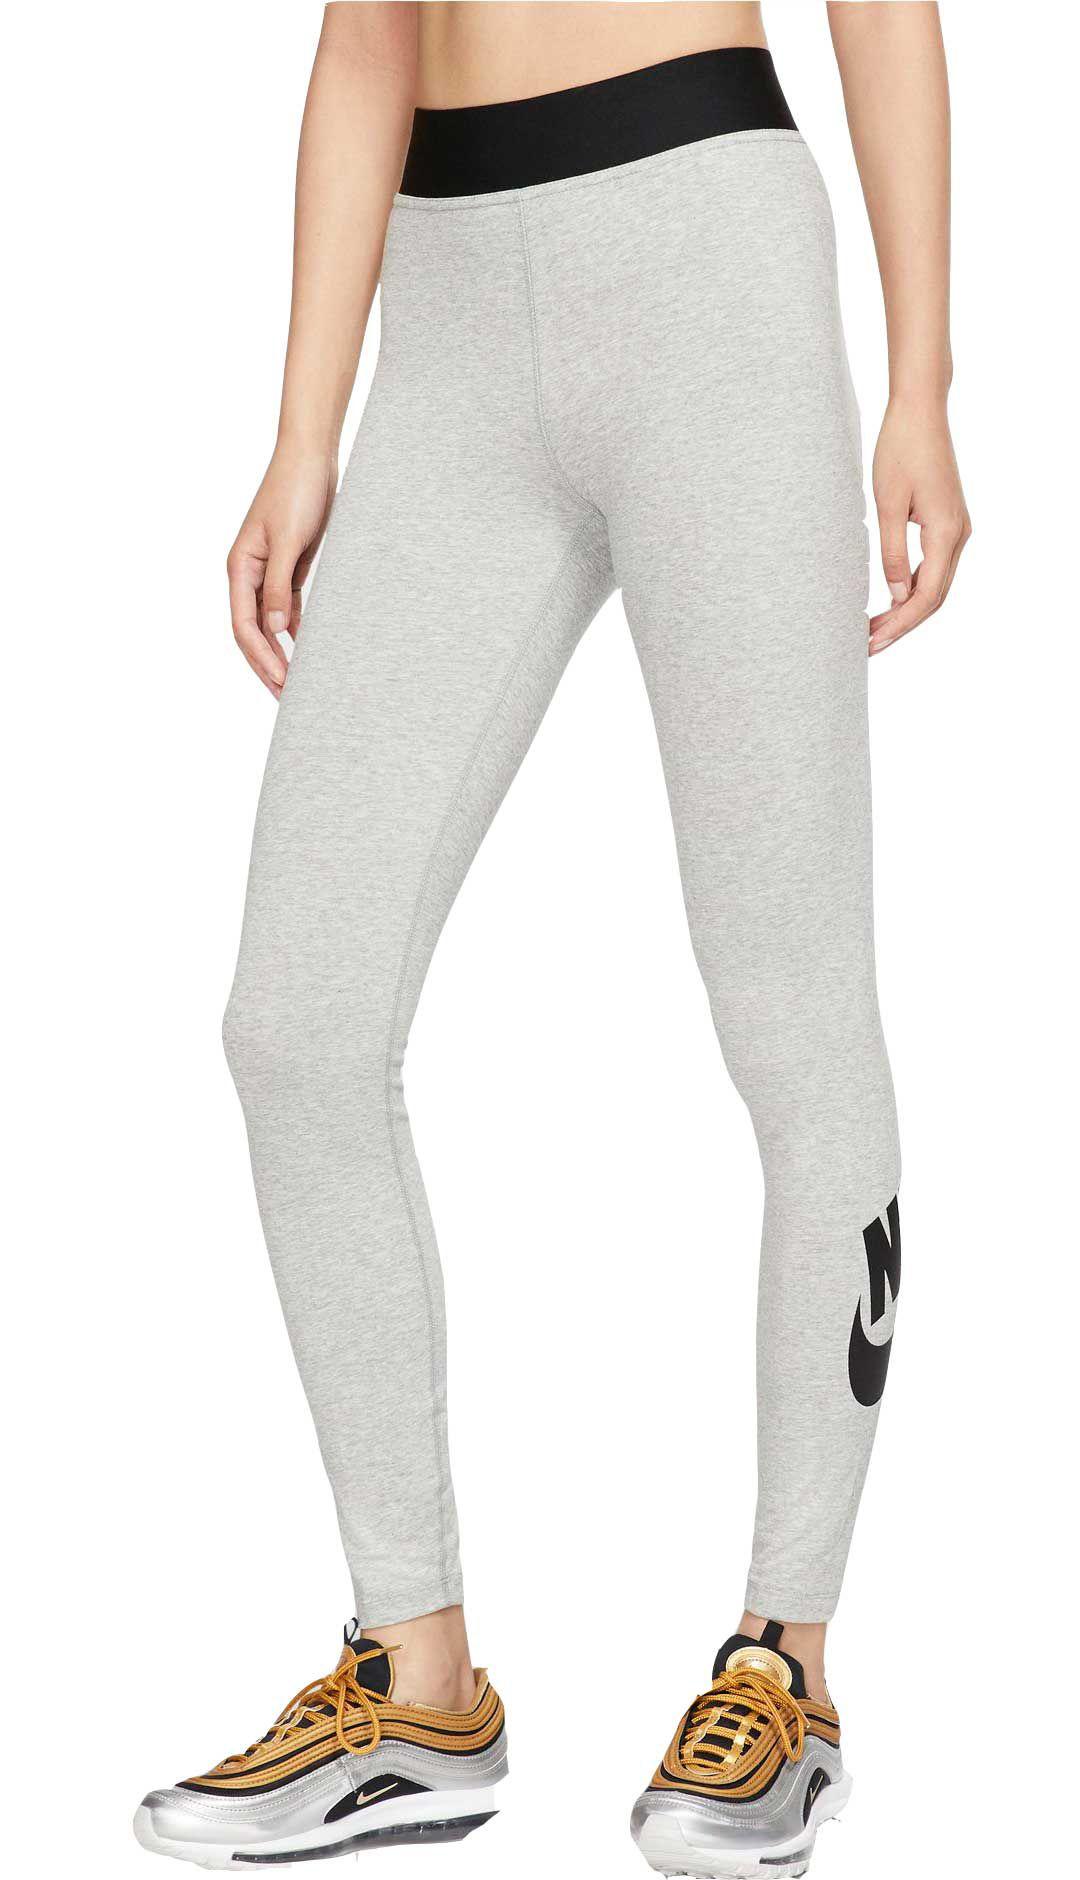 2b8c1fa1 Nike Women's Sportswear Leg-A-See High Rise Leggings